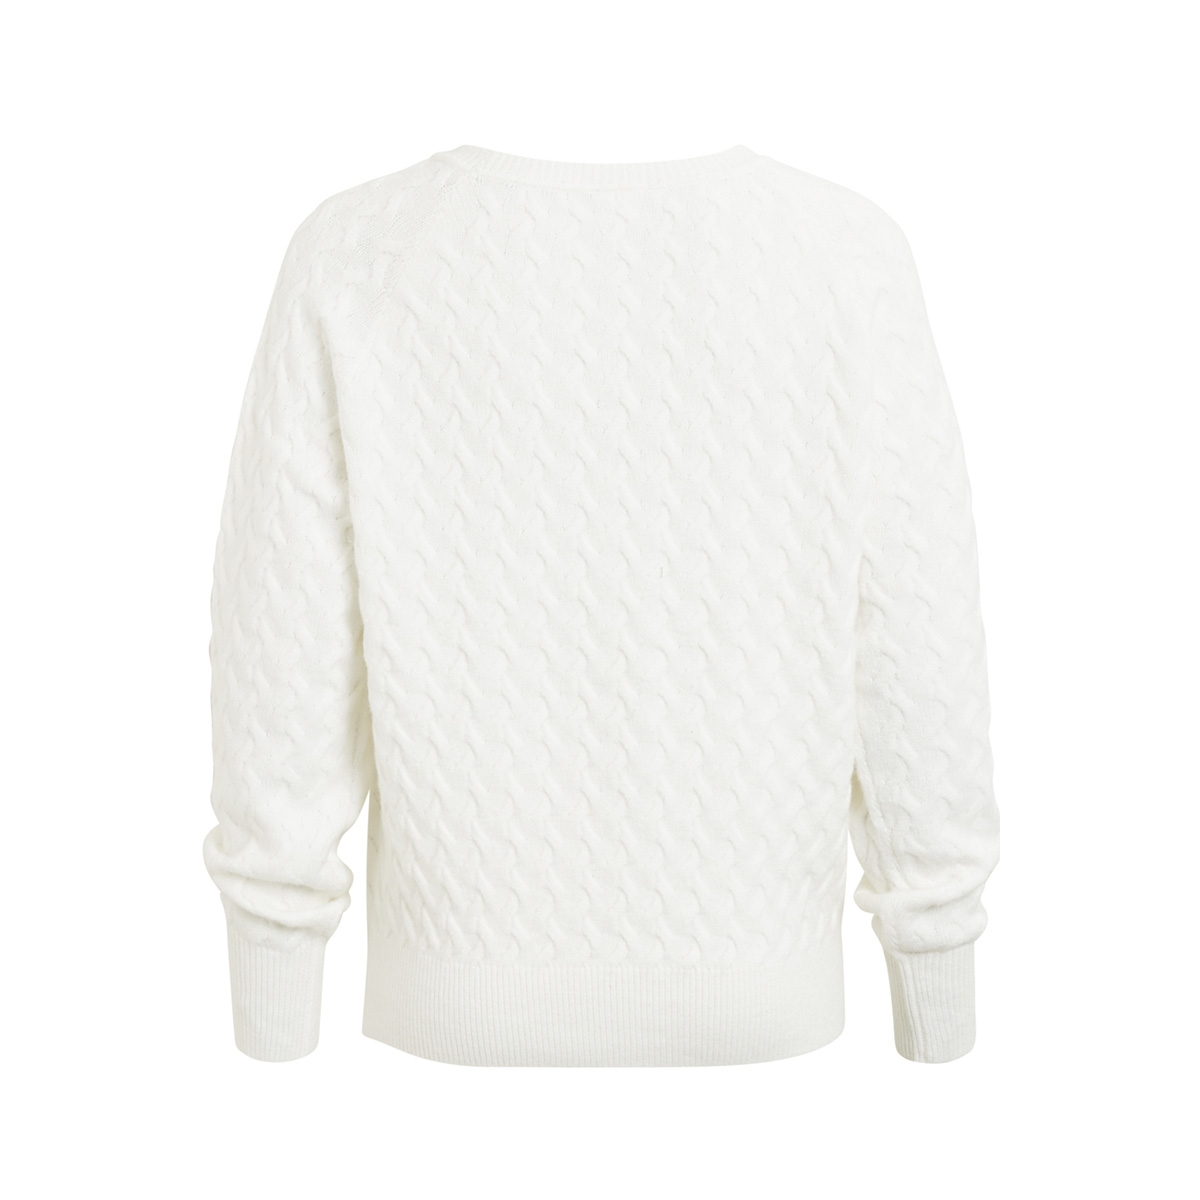 vixa l/s knit top 14044547 vila trui white alyssum